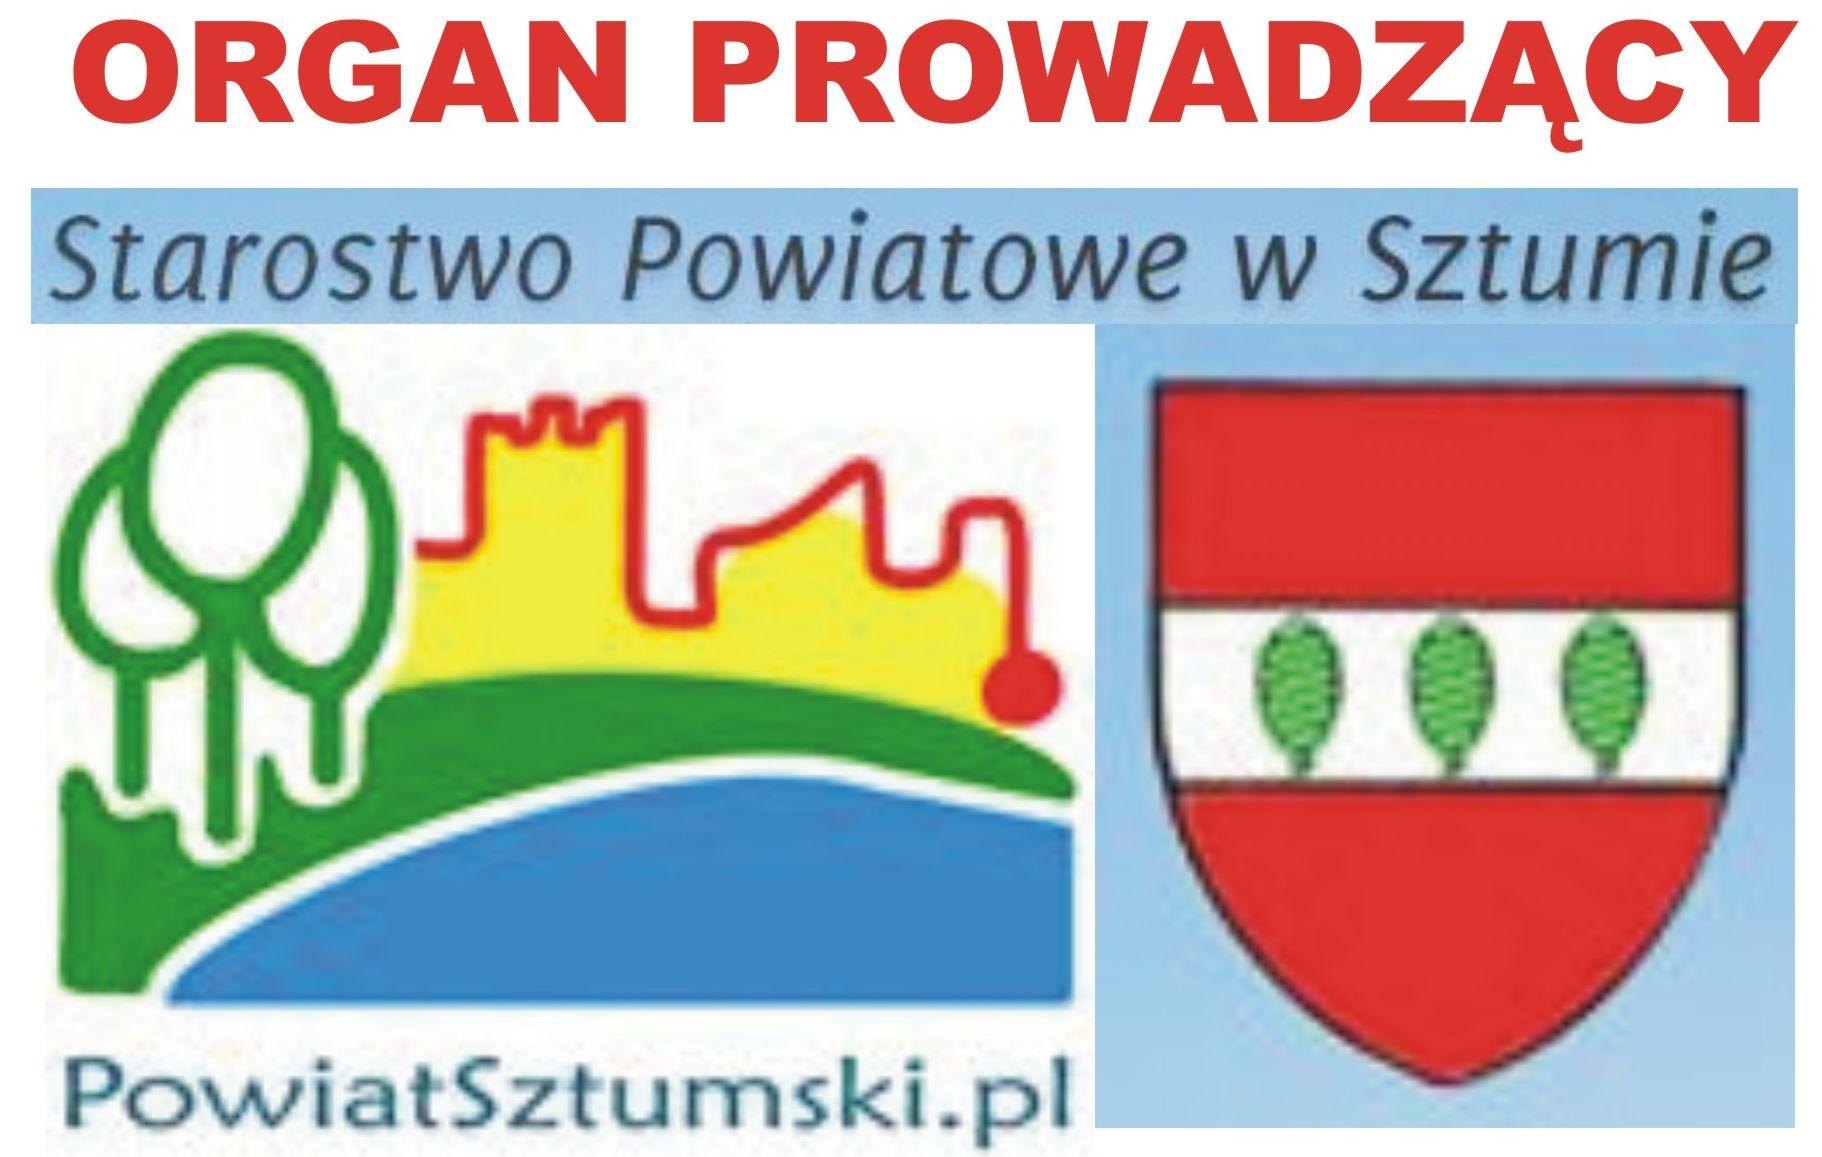 http://powiatsztumski.pl/